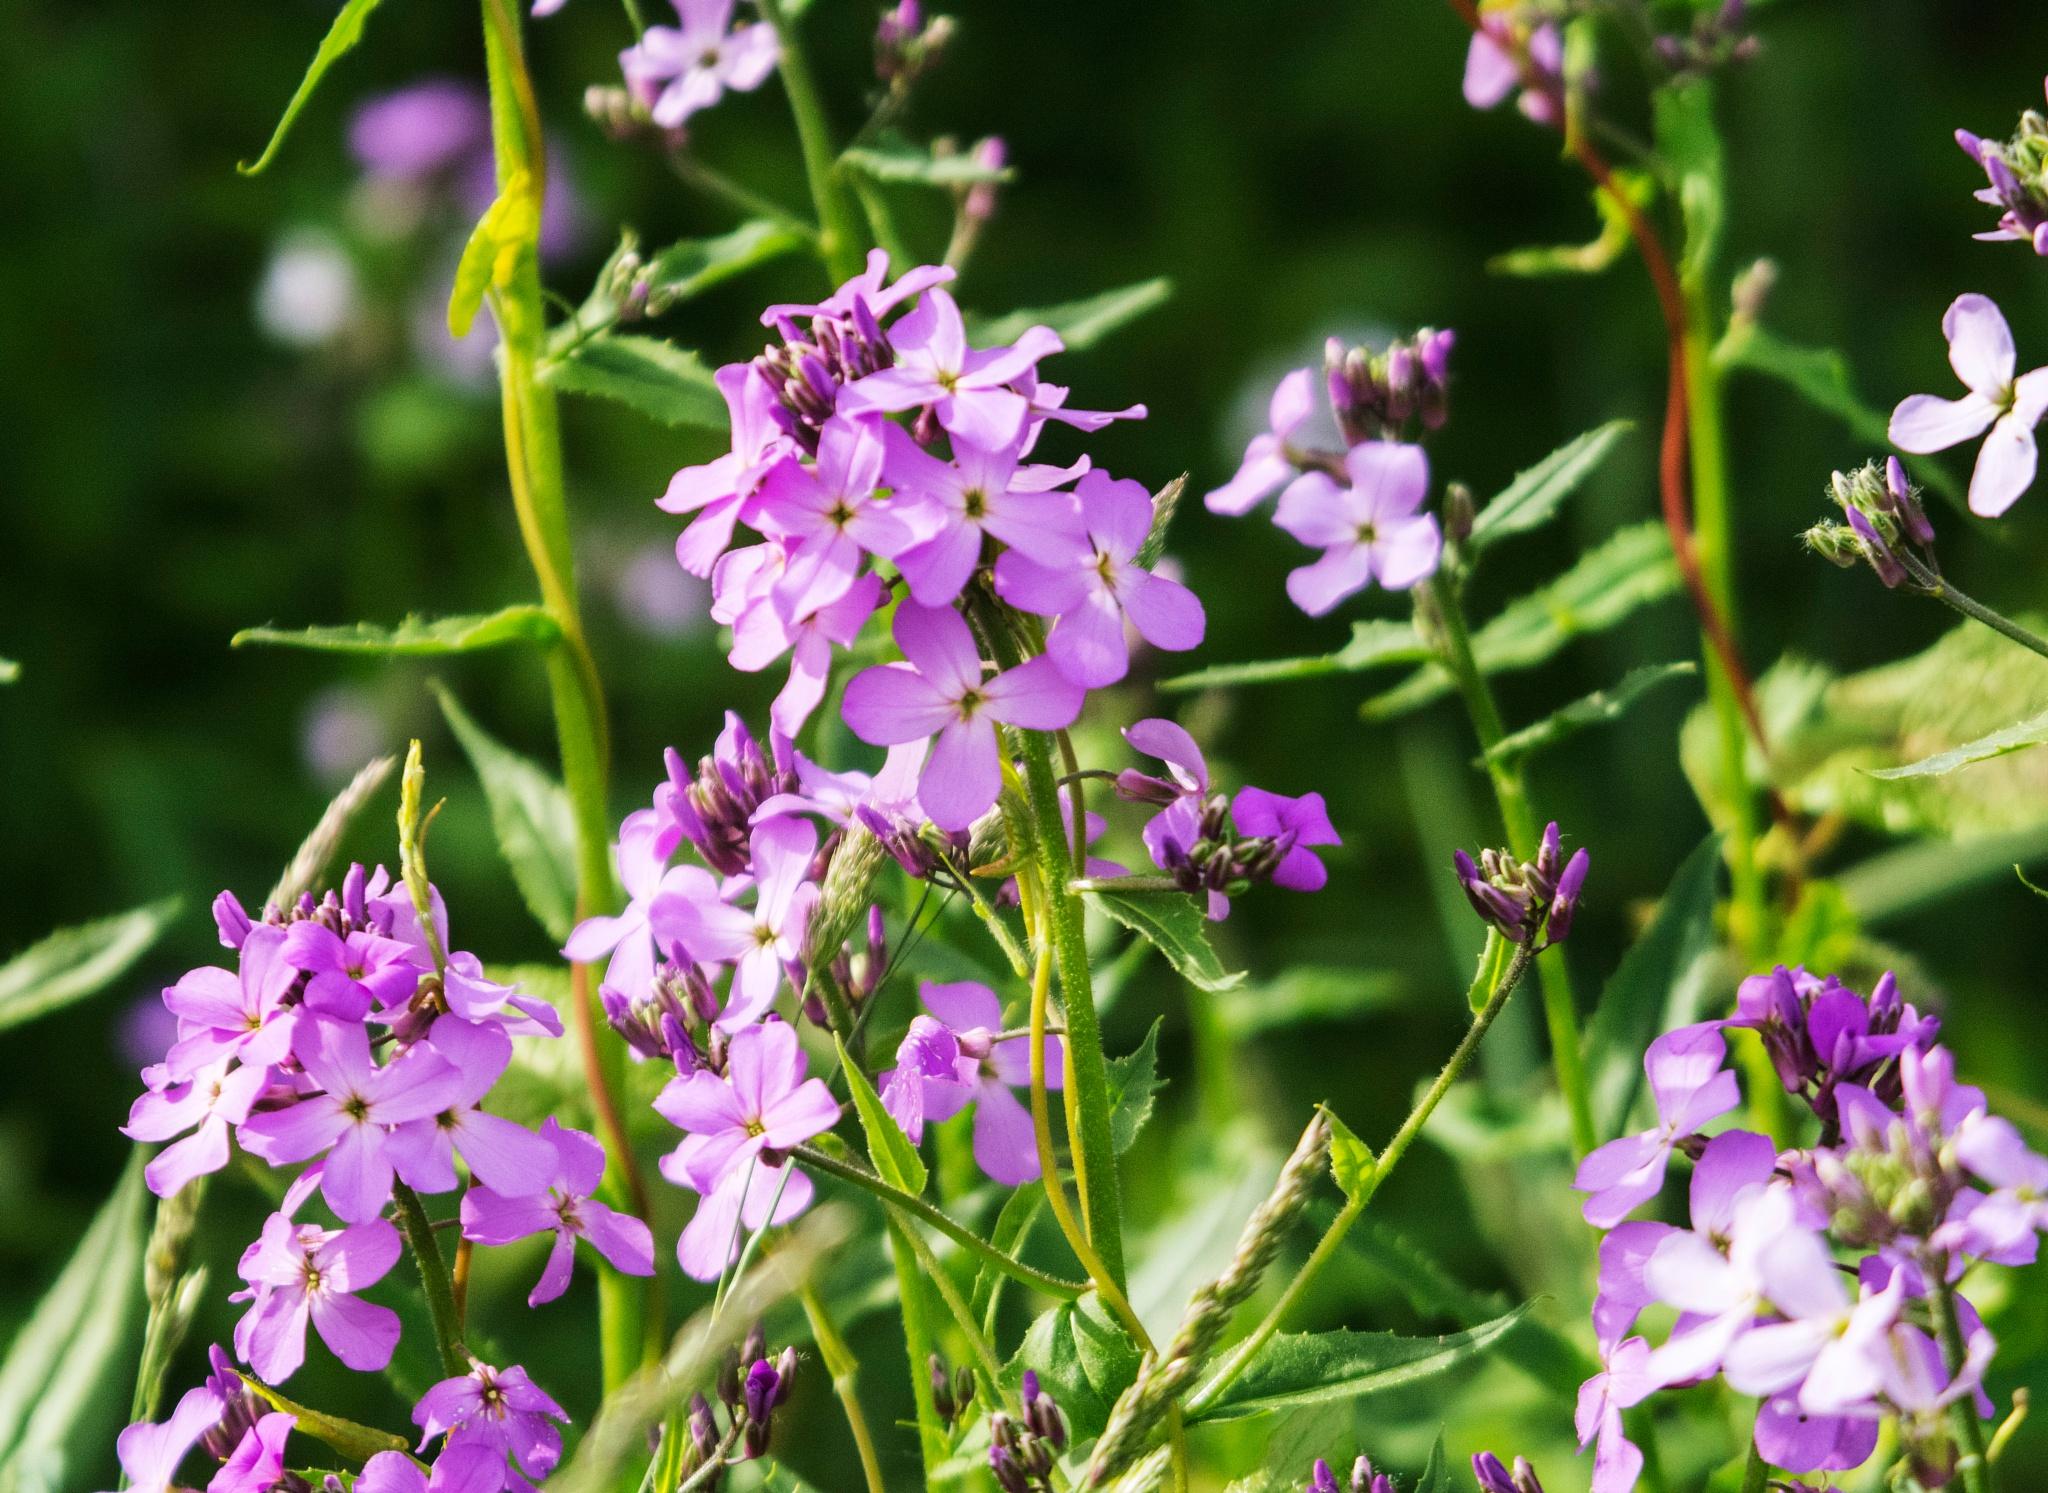 Wild Flowers II by Wayne L. Talbot